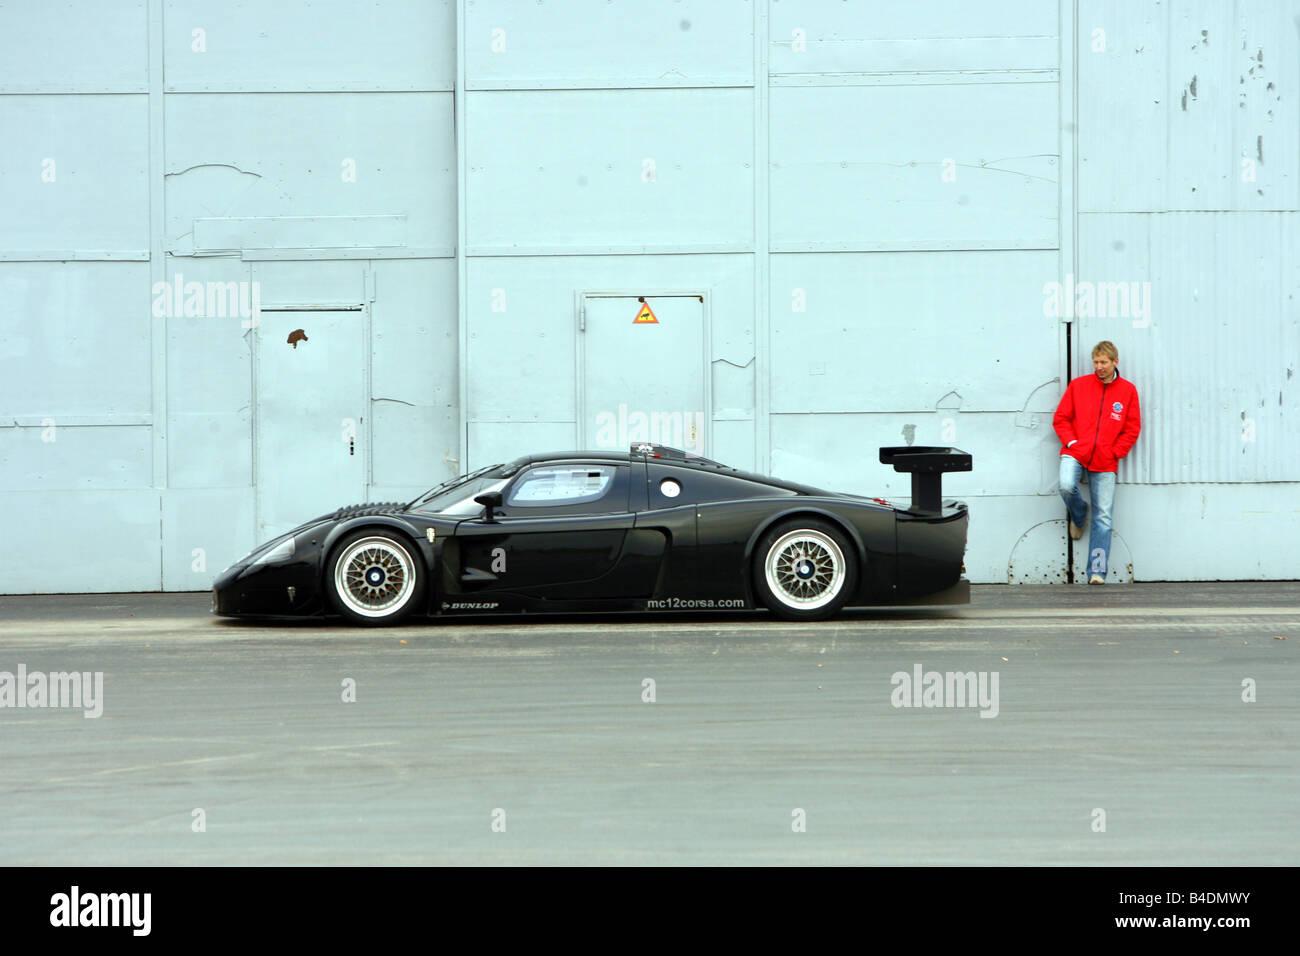 Maserati MC 12 Corsa, model year 2007-, black, standing, upholding, side view - Stock Image